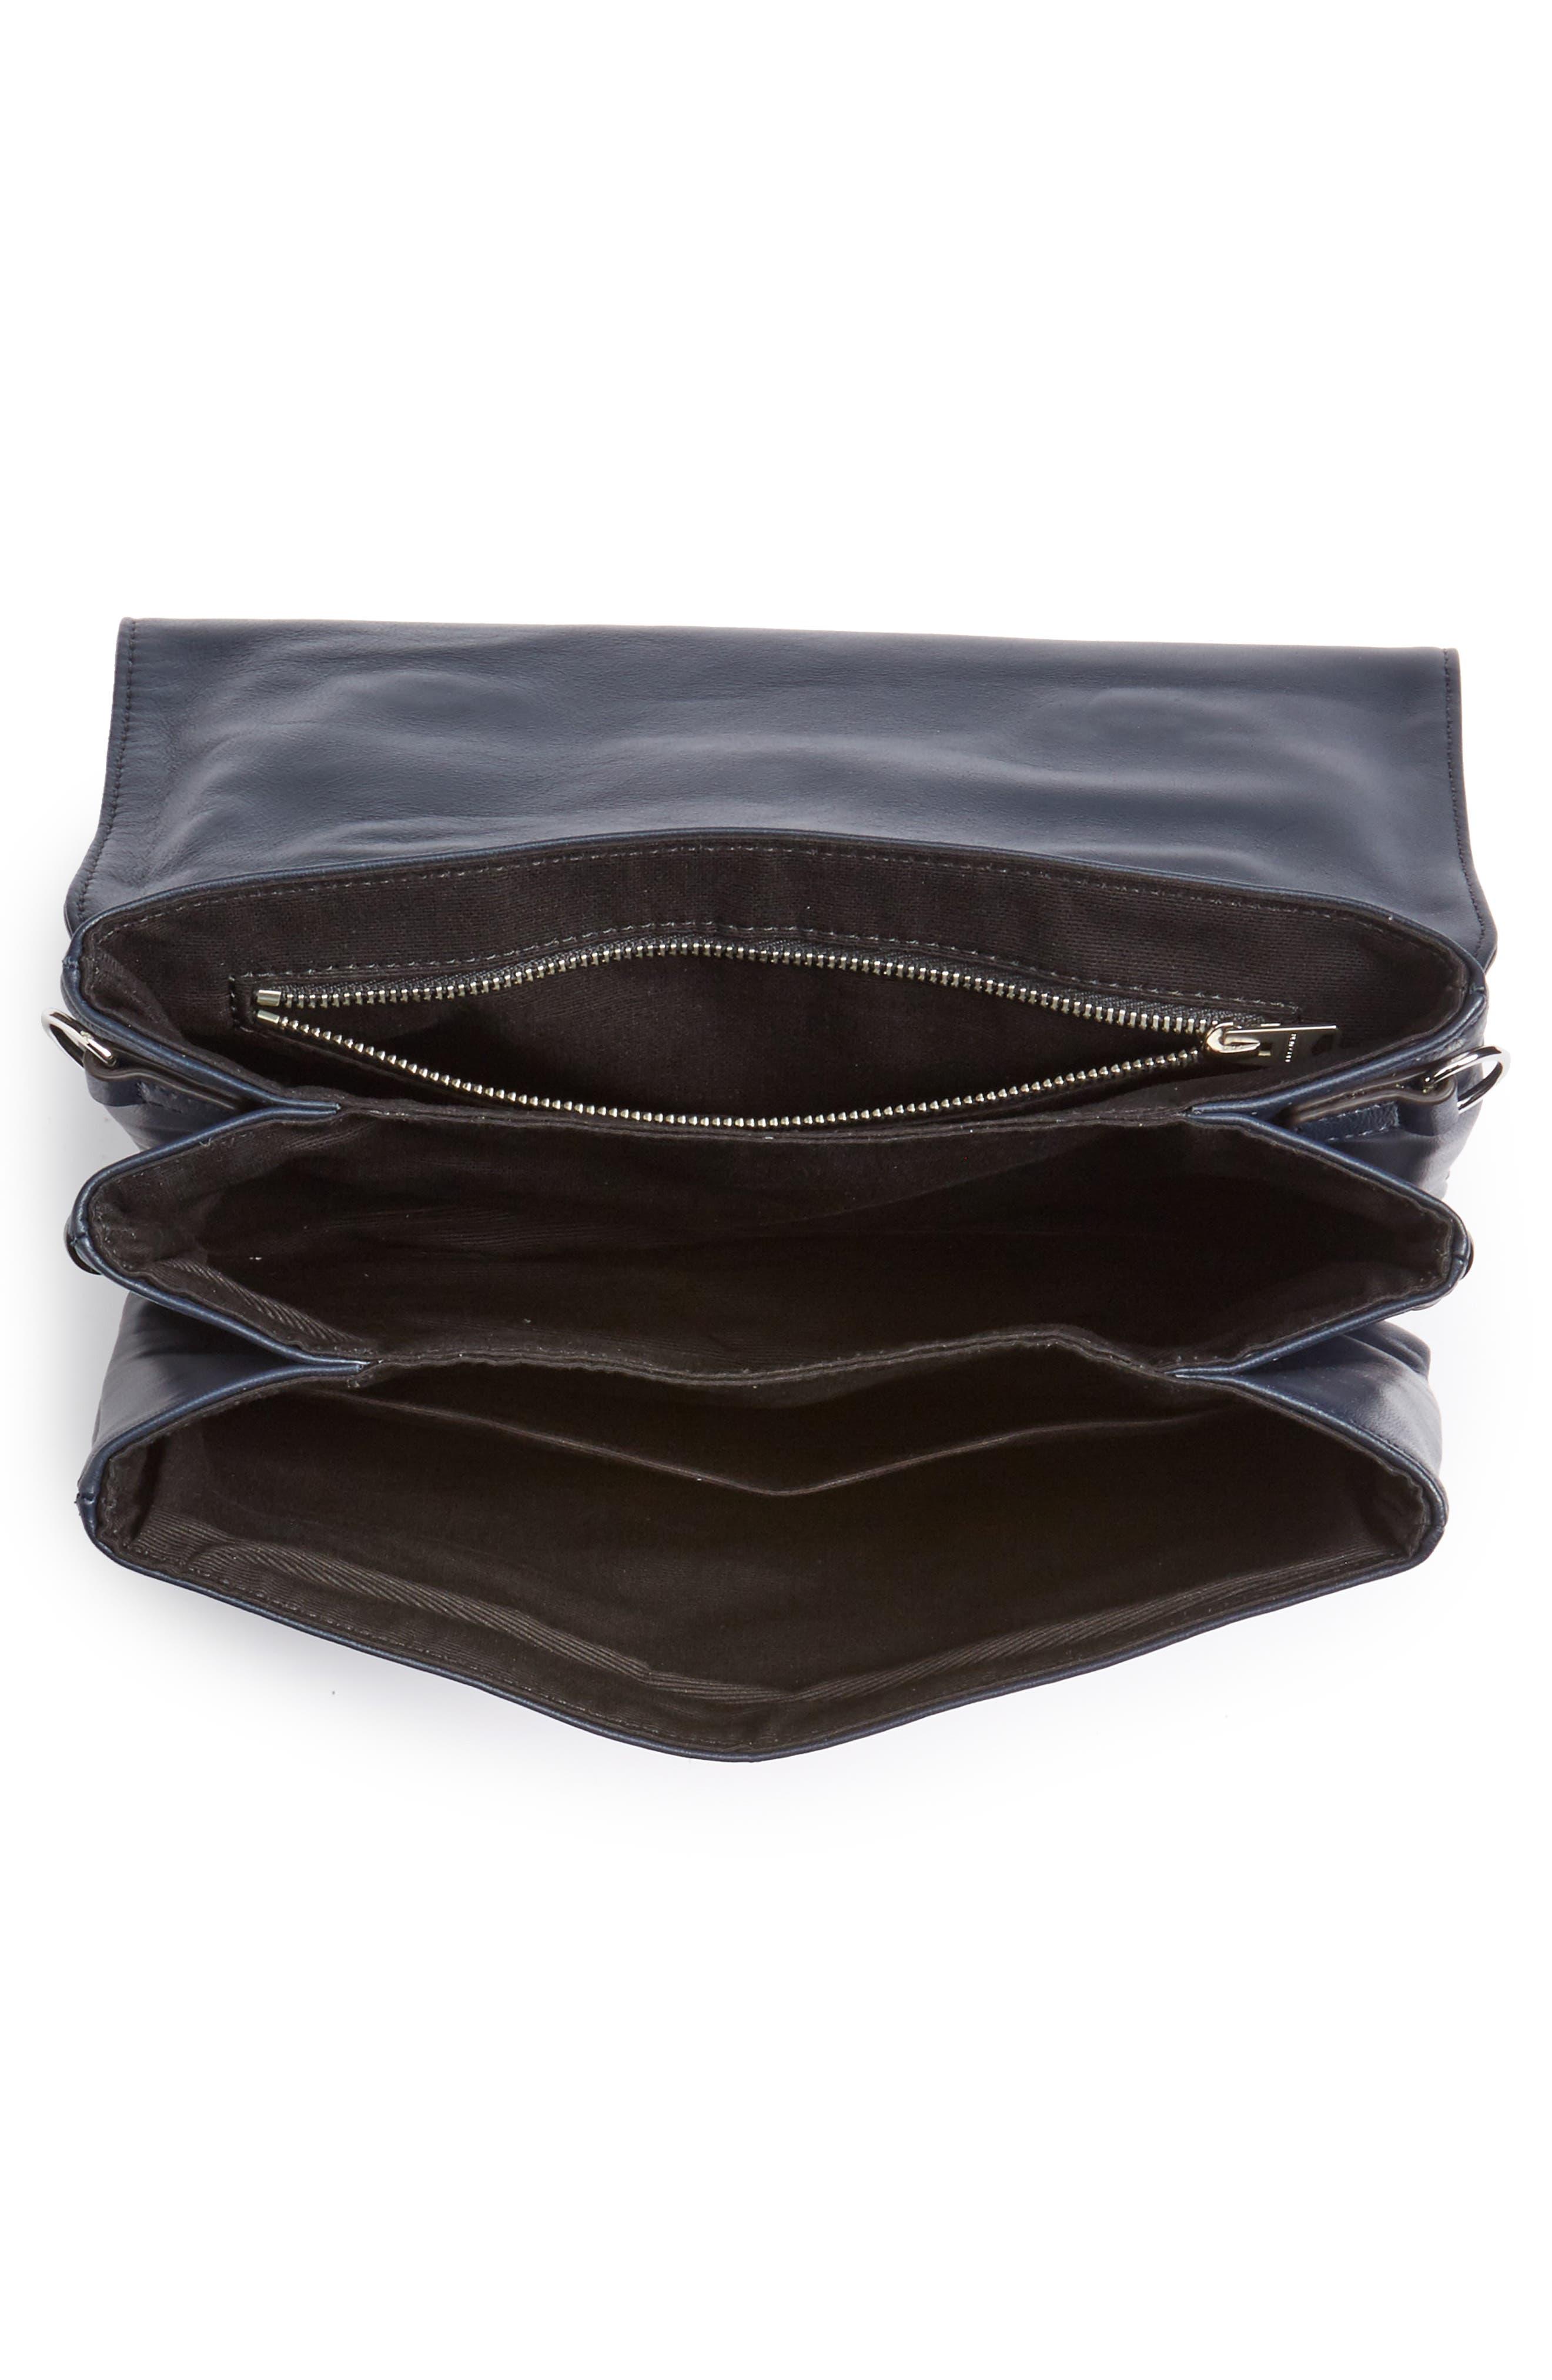 Fin Lambskin Leather Messenger Bag,                             Alternate thumbnail 8, color,